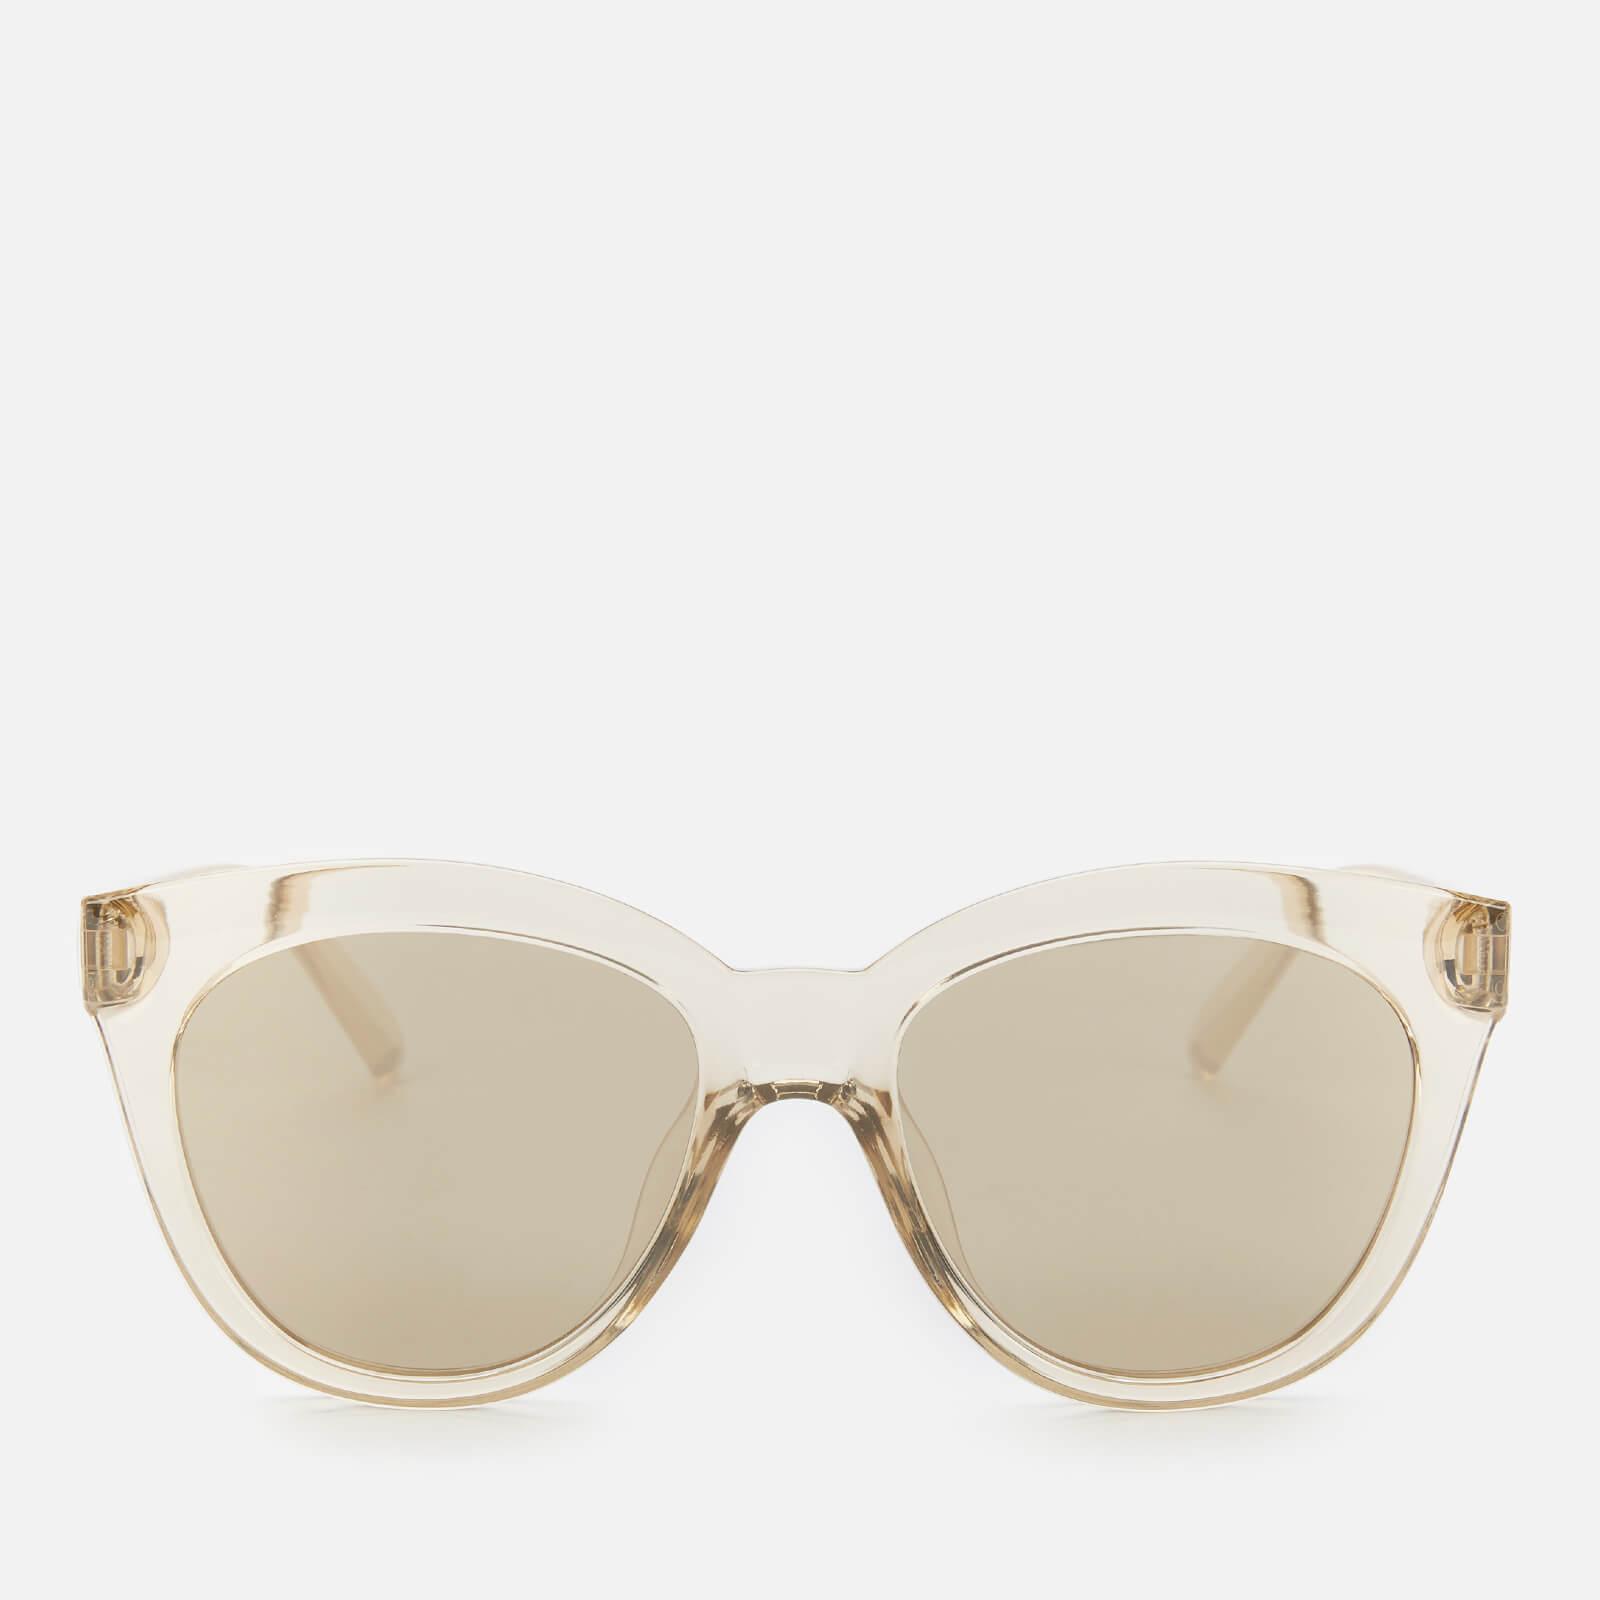 Le Specs Women's Resumption Round Sunglasses - Stone